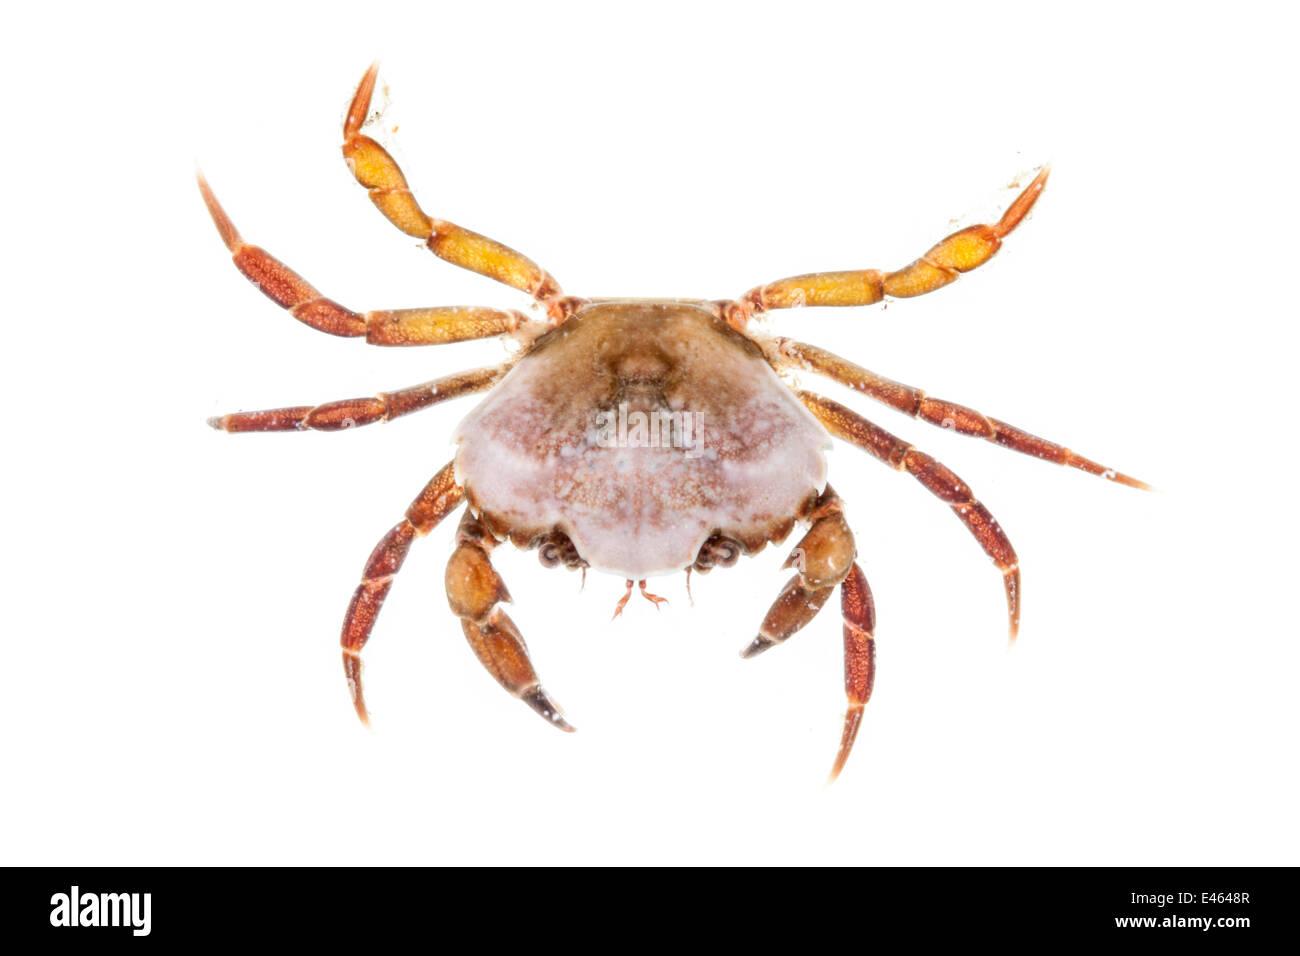 Shore Crab (Carcinus maenas) against white background. From the Isle of Skye, Inner Hebrides, Scotland, UK. Stock Photo